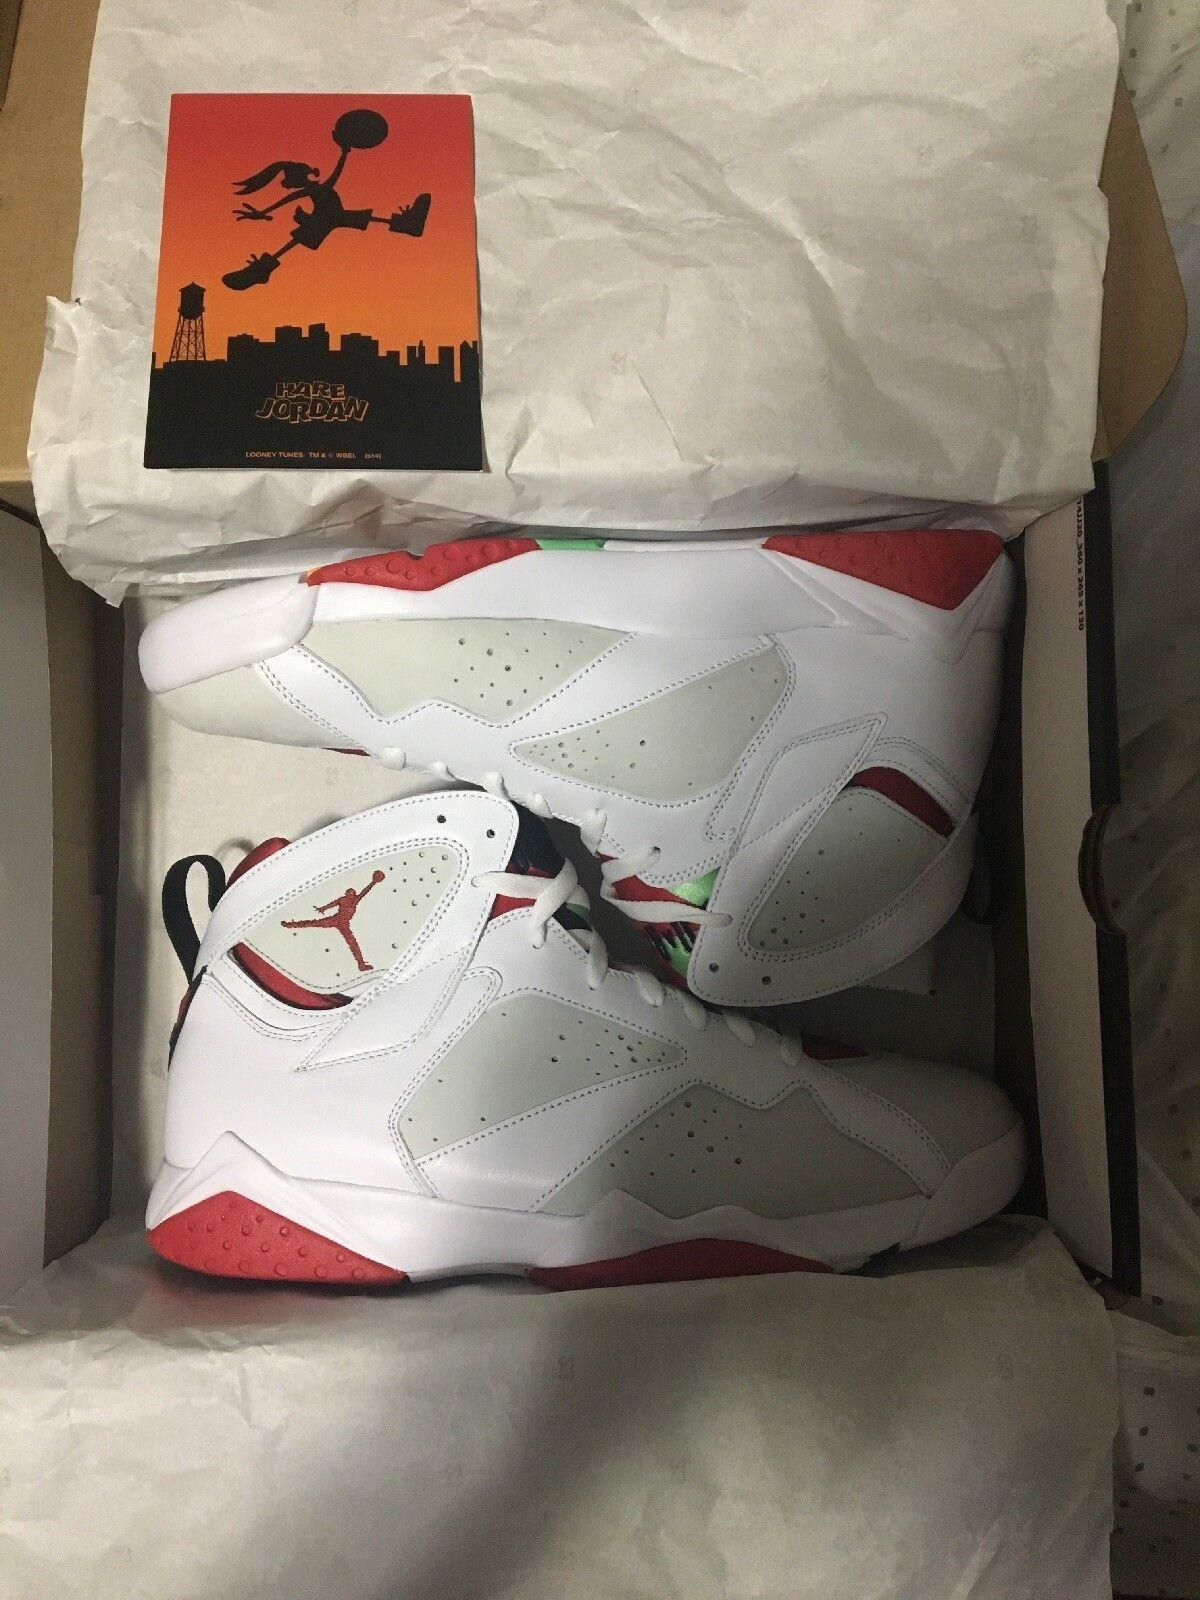 Nike air retrò jordan 7 retrò air hare taglia 12 nuovi in scatola cf4a5e